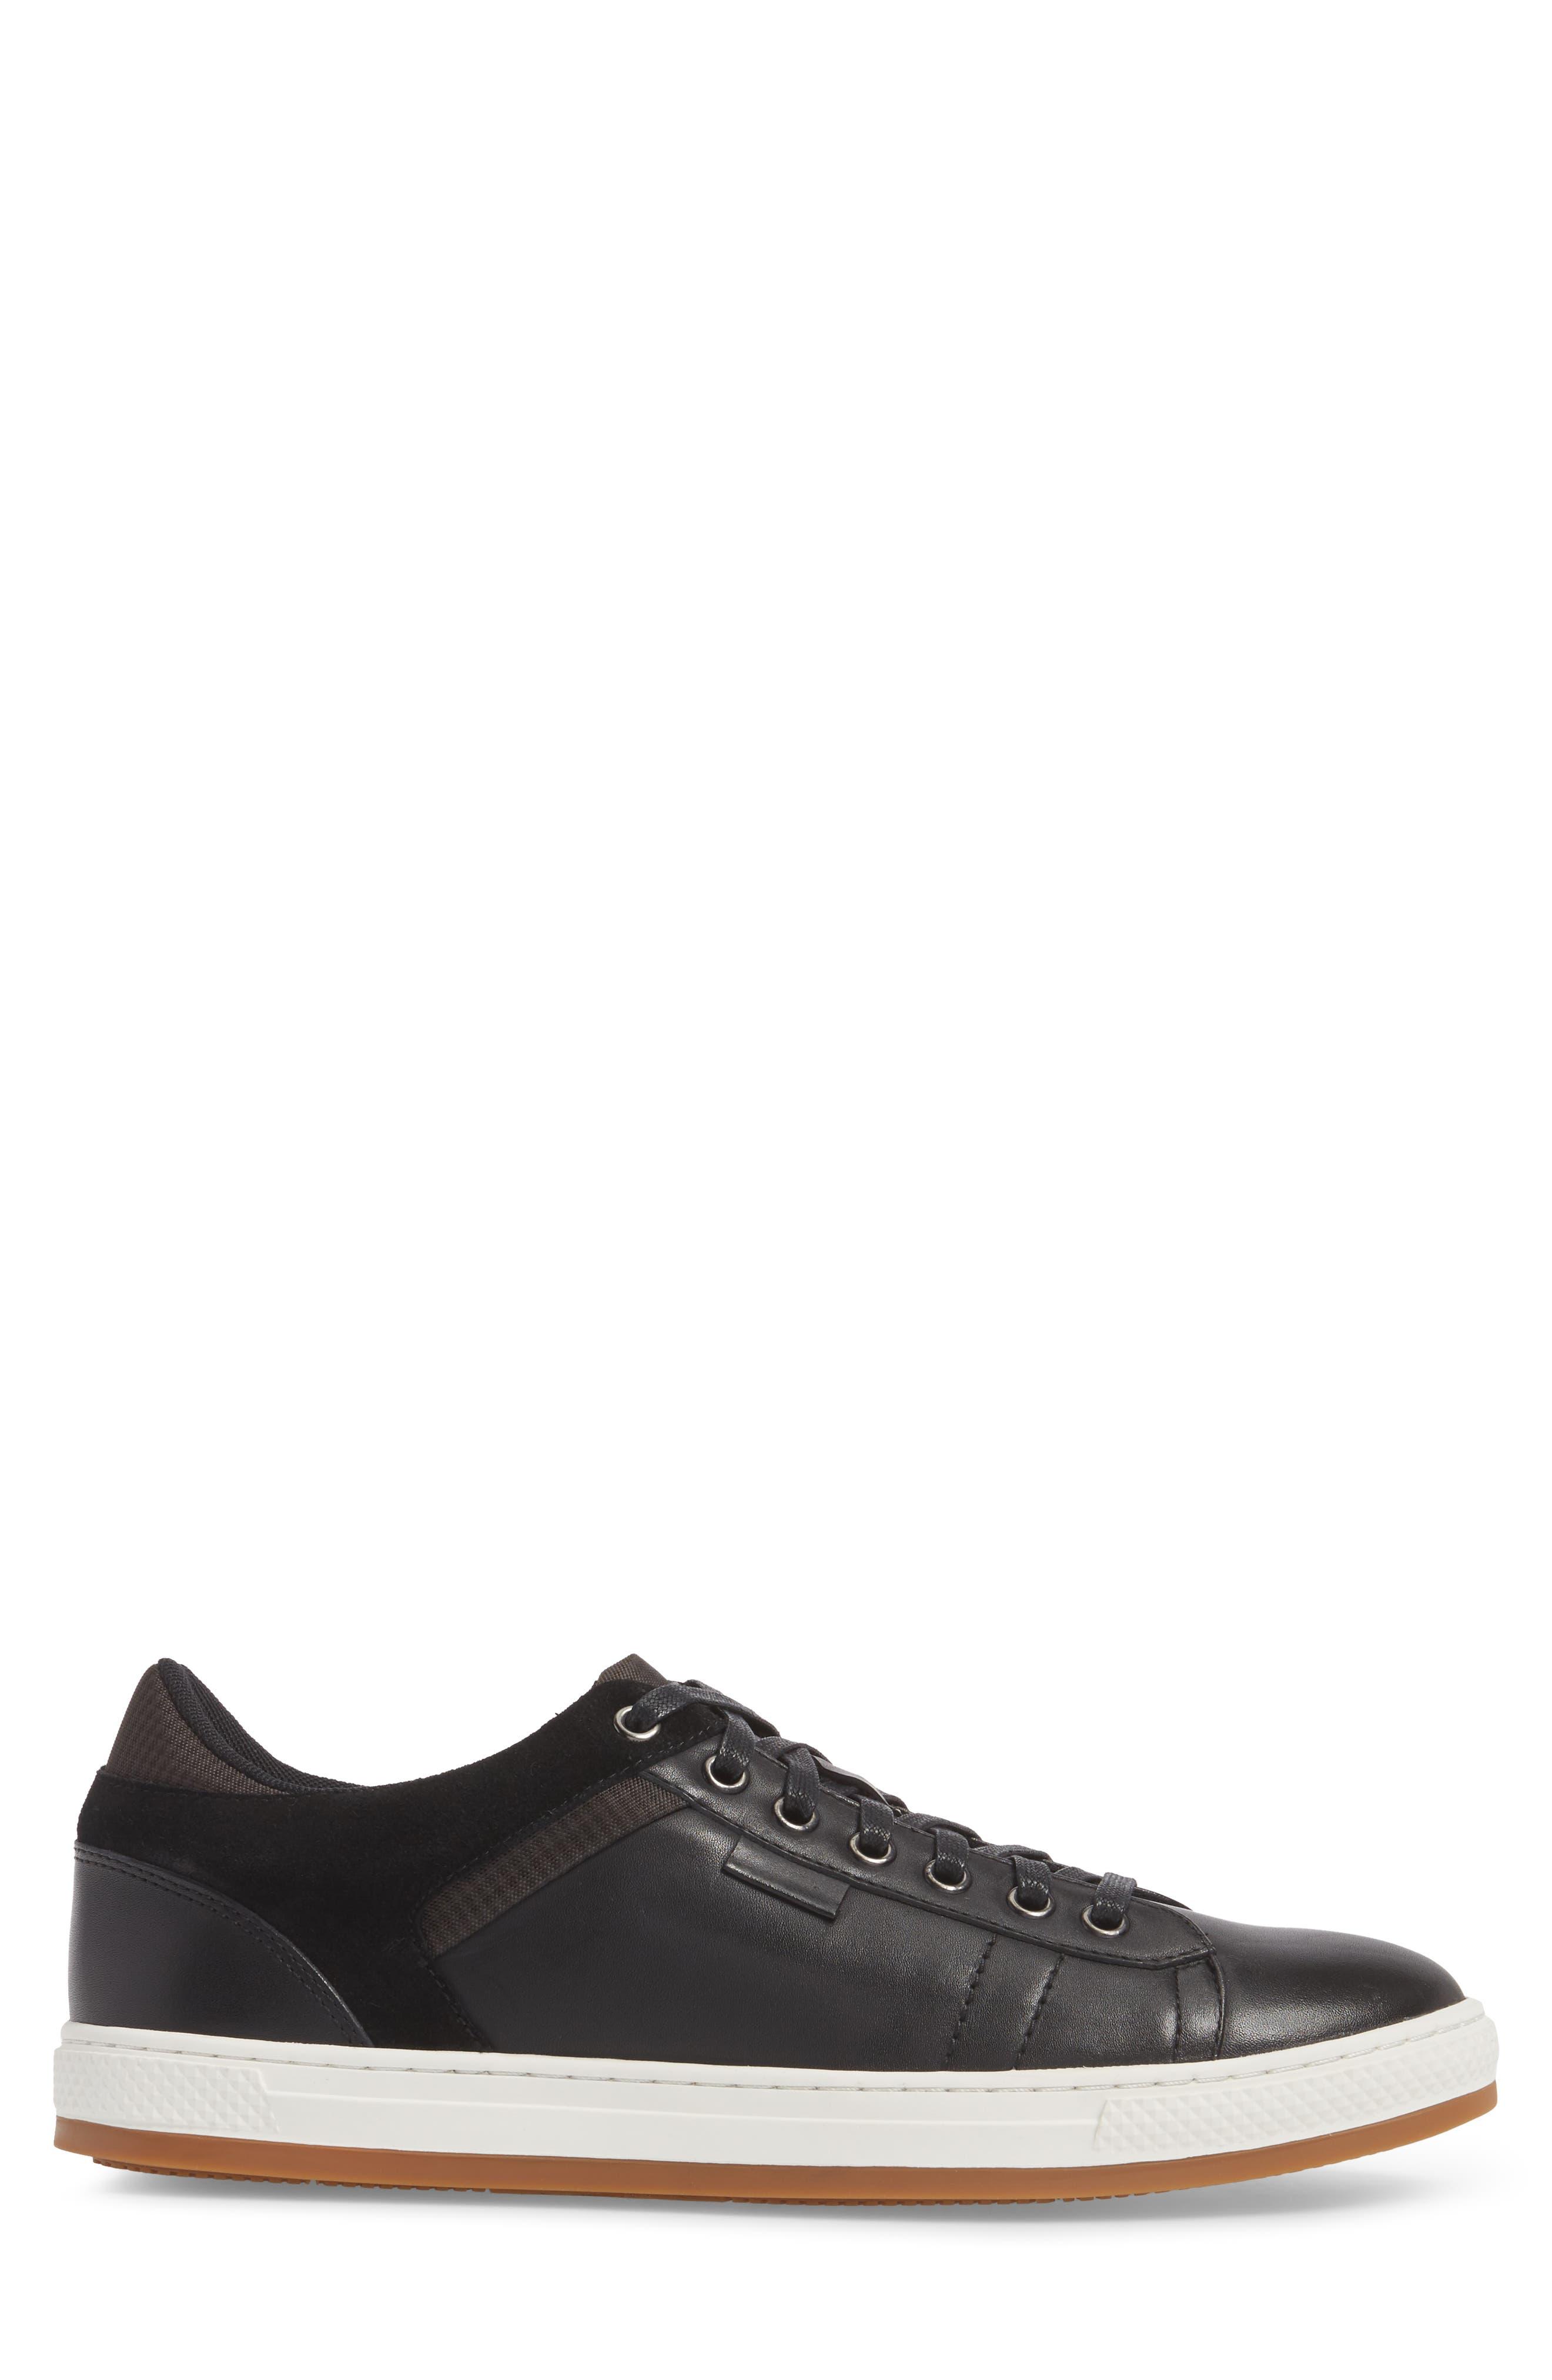 Ireton Low Top Sneaker,                             Alternate thumbnail 3, color,                             BLACK LEATHER/ SUEDE